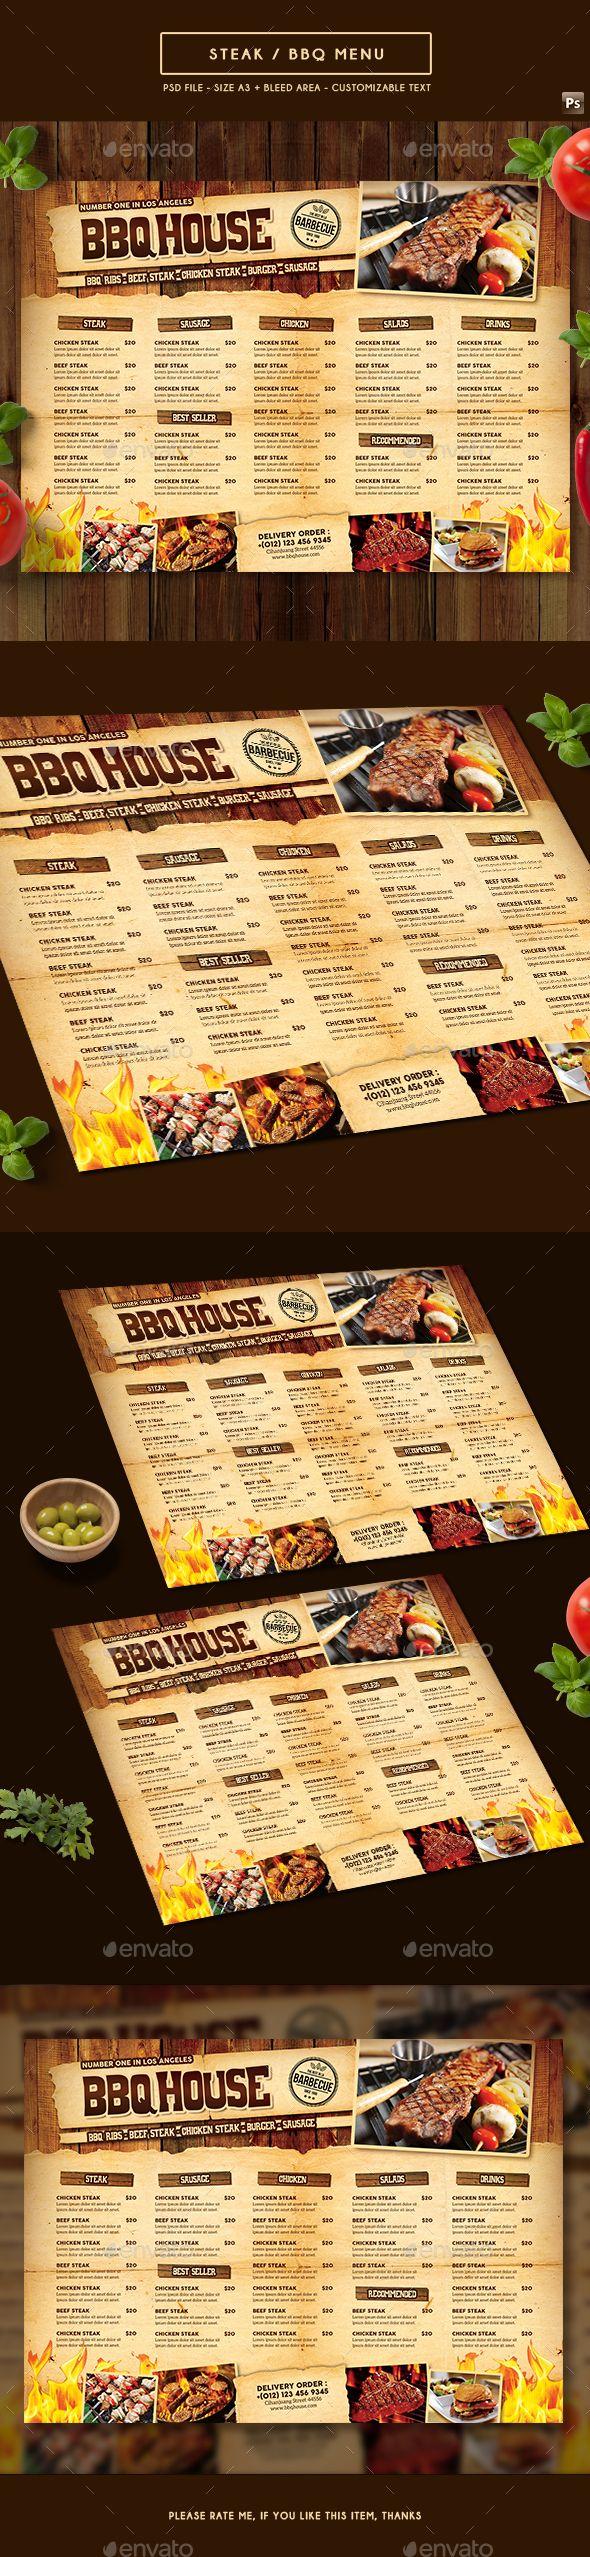 BBQ / Steak Menu - Food Menus Print Templates Download here : https://graphicriver.net/item/bbq-steak-menu/19254774?s_rank=86&ref=Al-fatih